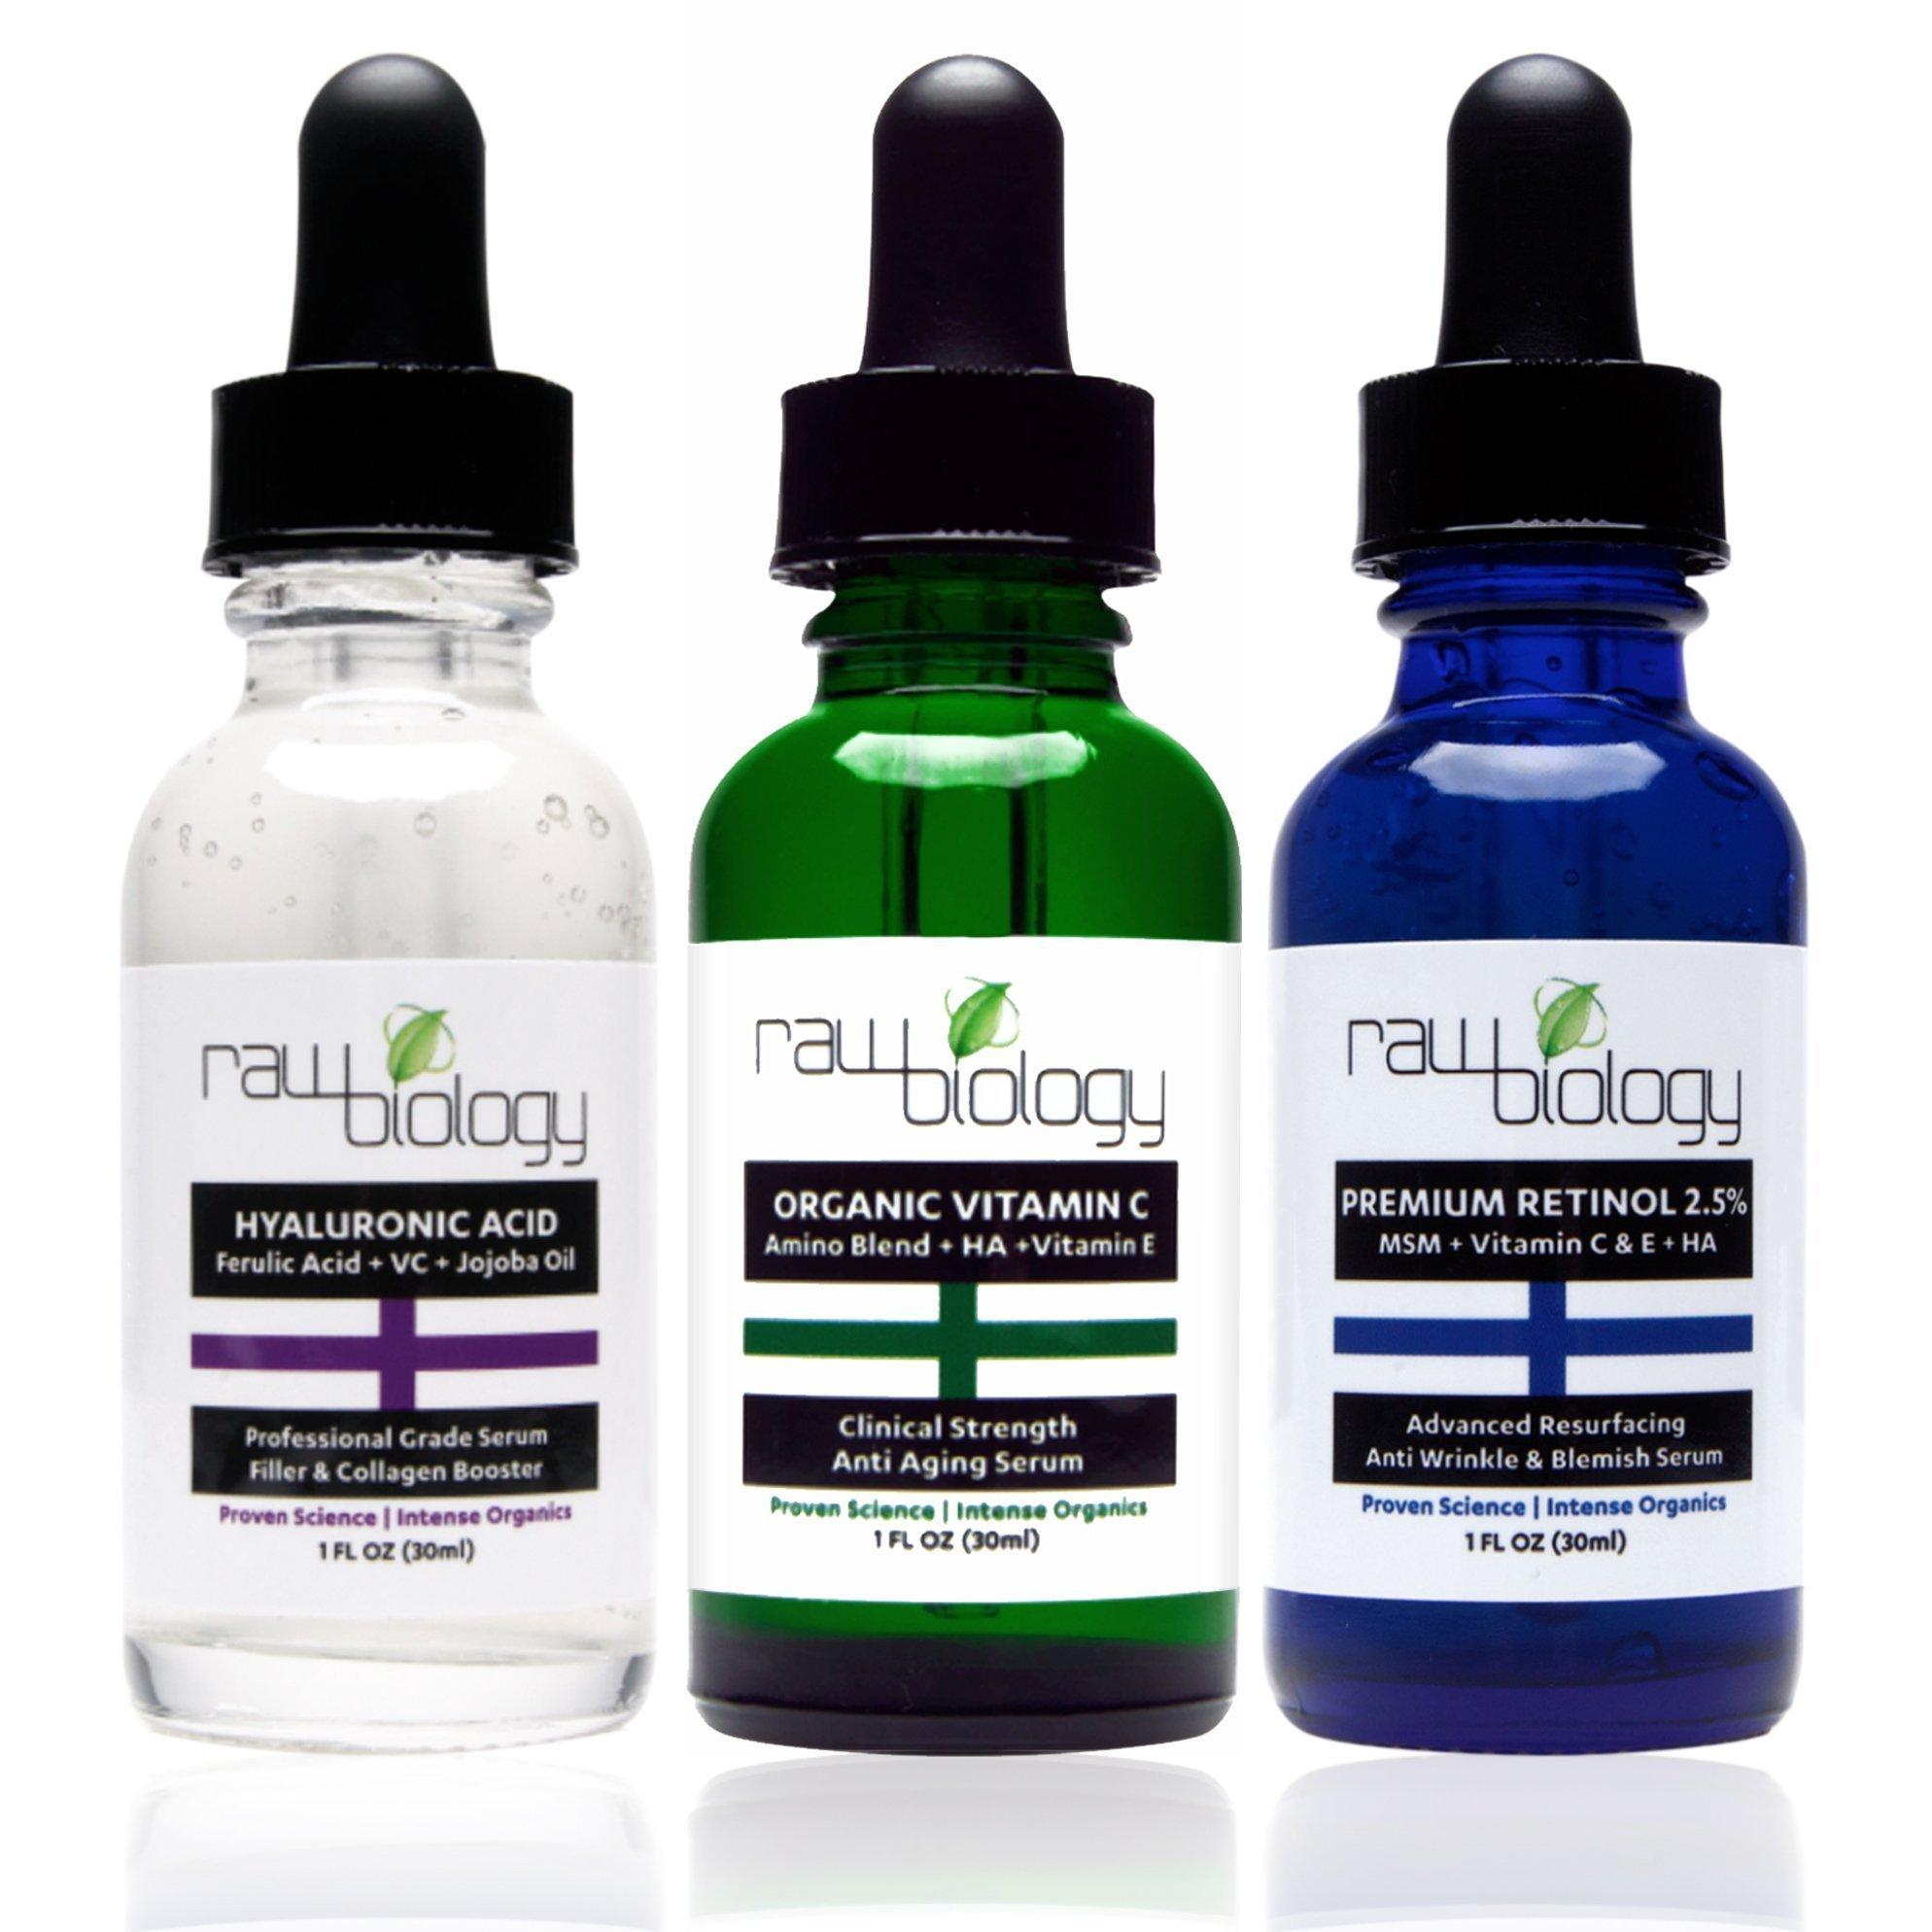 Raw Biology Organic Liquid Facelift with Vitamin C Serum, Retinol and Hyaluronic Acid for Skin by Raw Biology